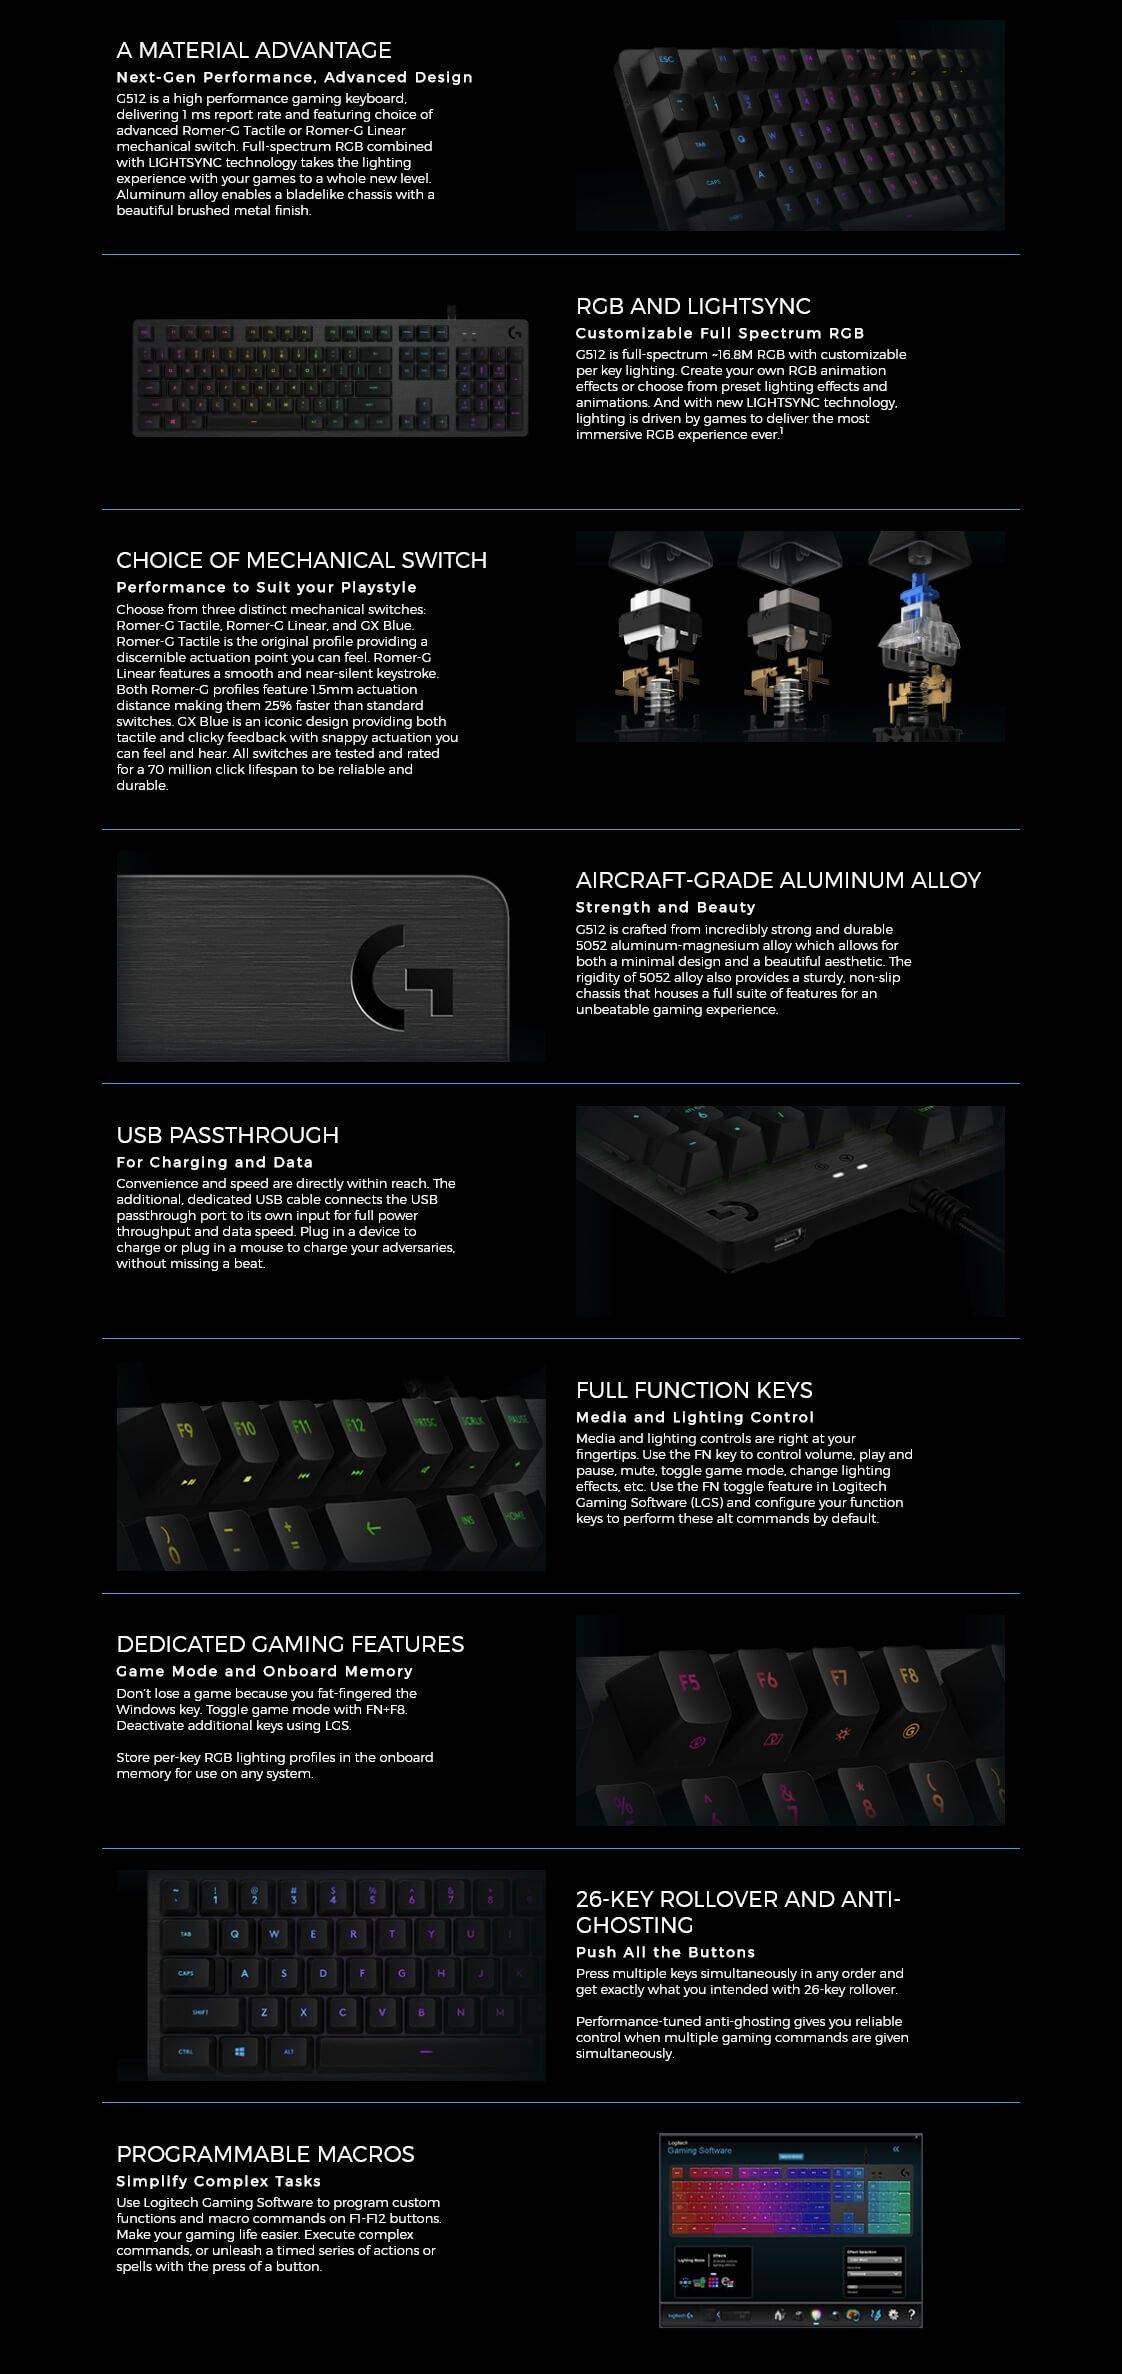 b0ccae0b012 Logitech G512 RGB Mechanical Gaming Keyboard - Linear (920-008762 ...